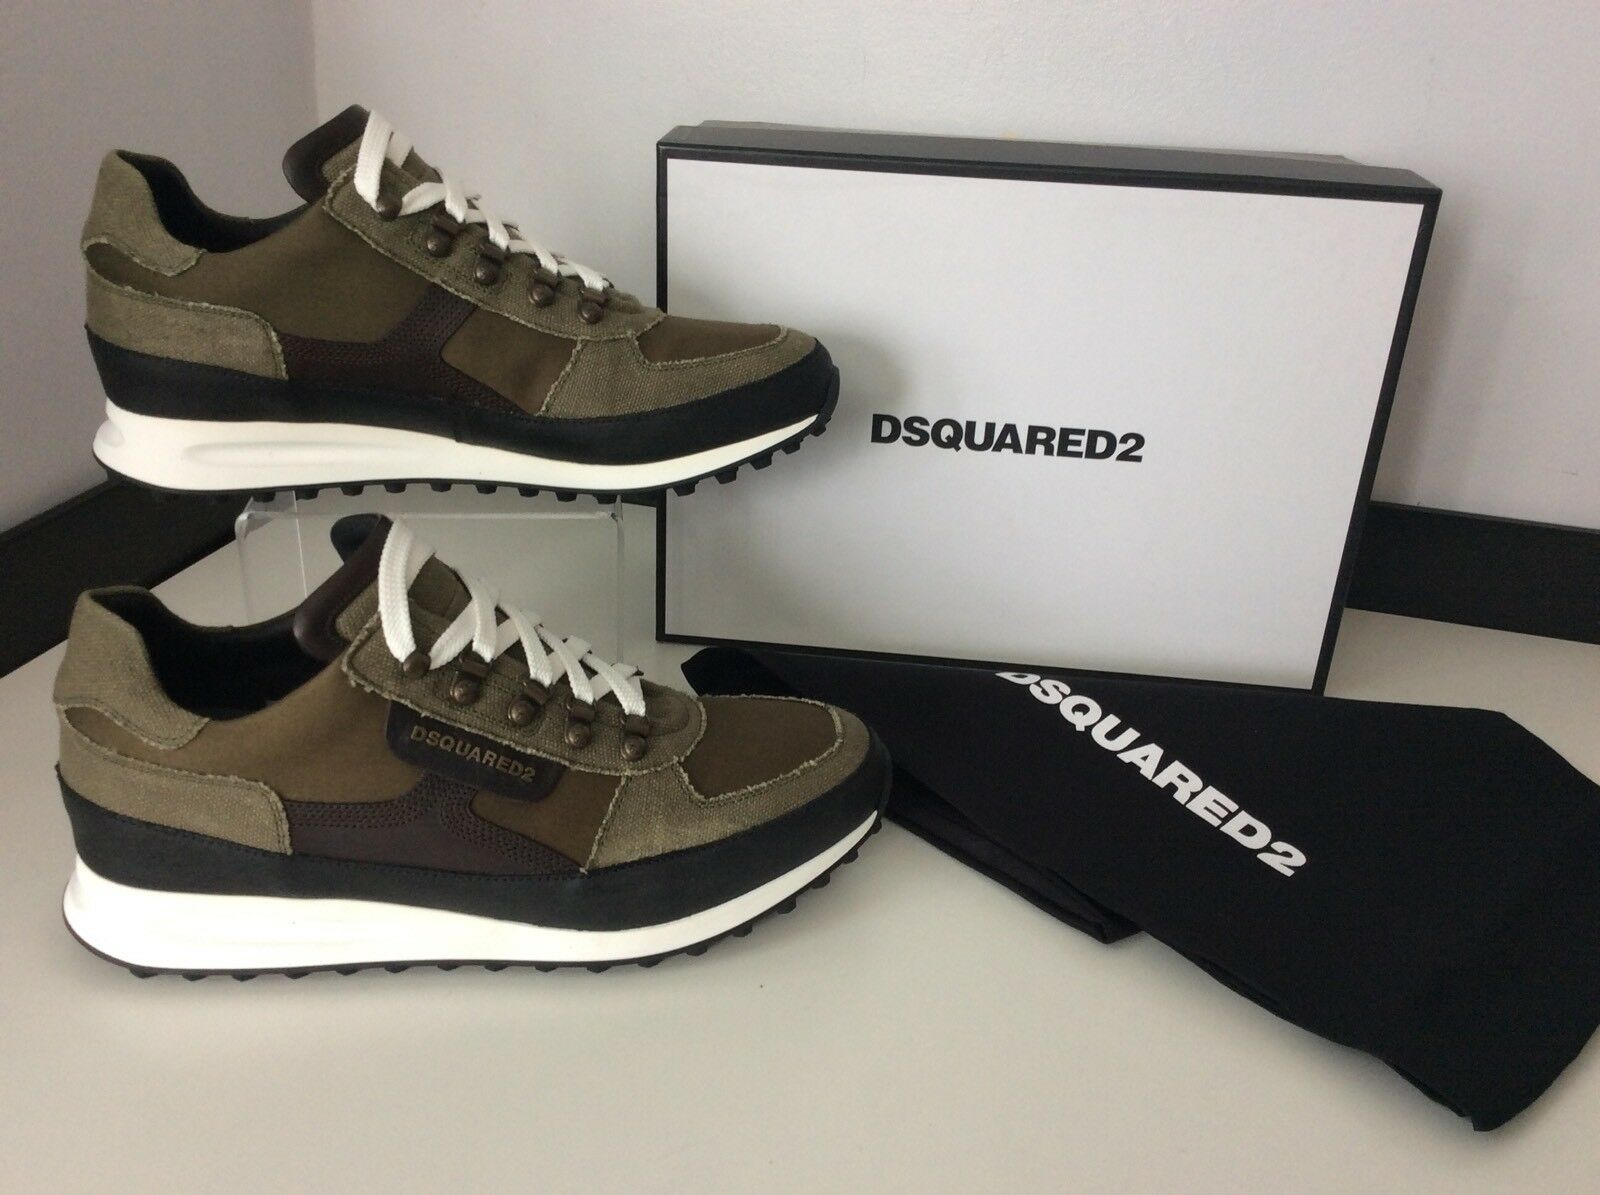 DsquaROT2 Ds2 Sneakers, Runners, Uk 7 Eu41, Military, Khaki Grün Canvas NEW